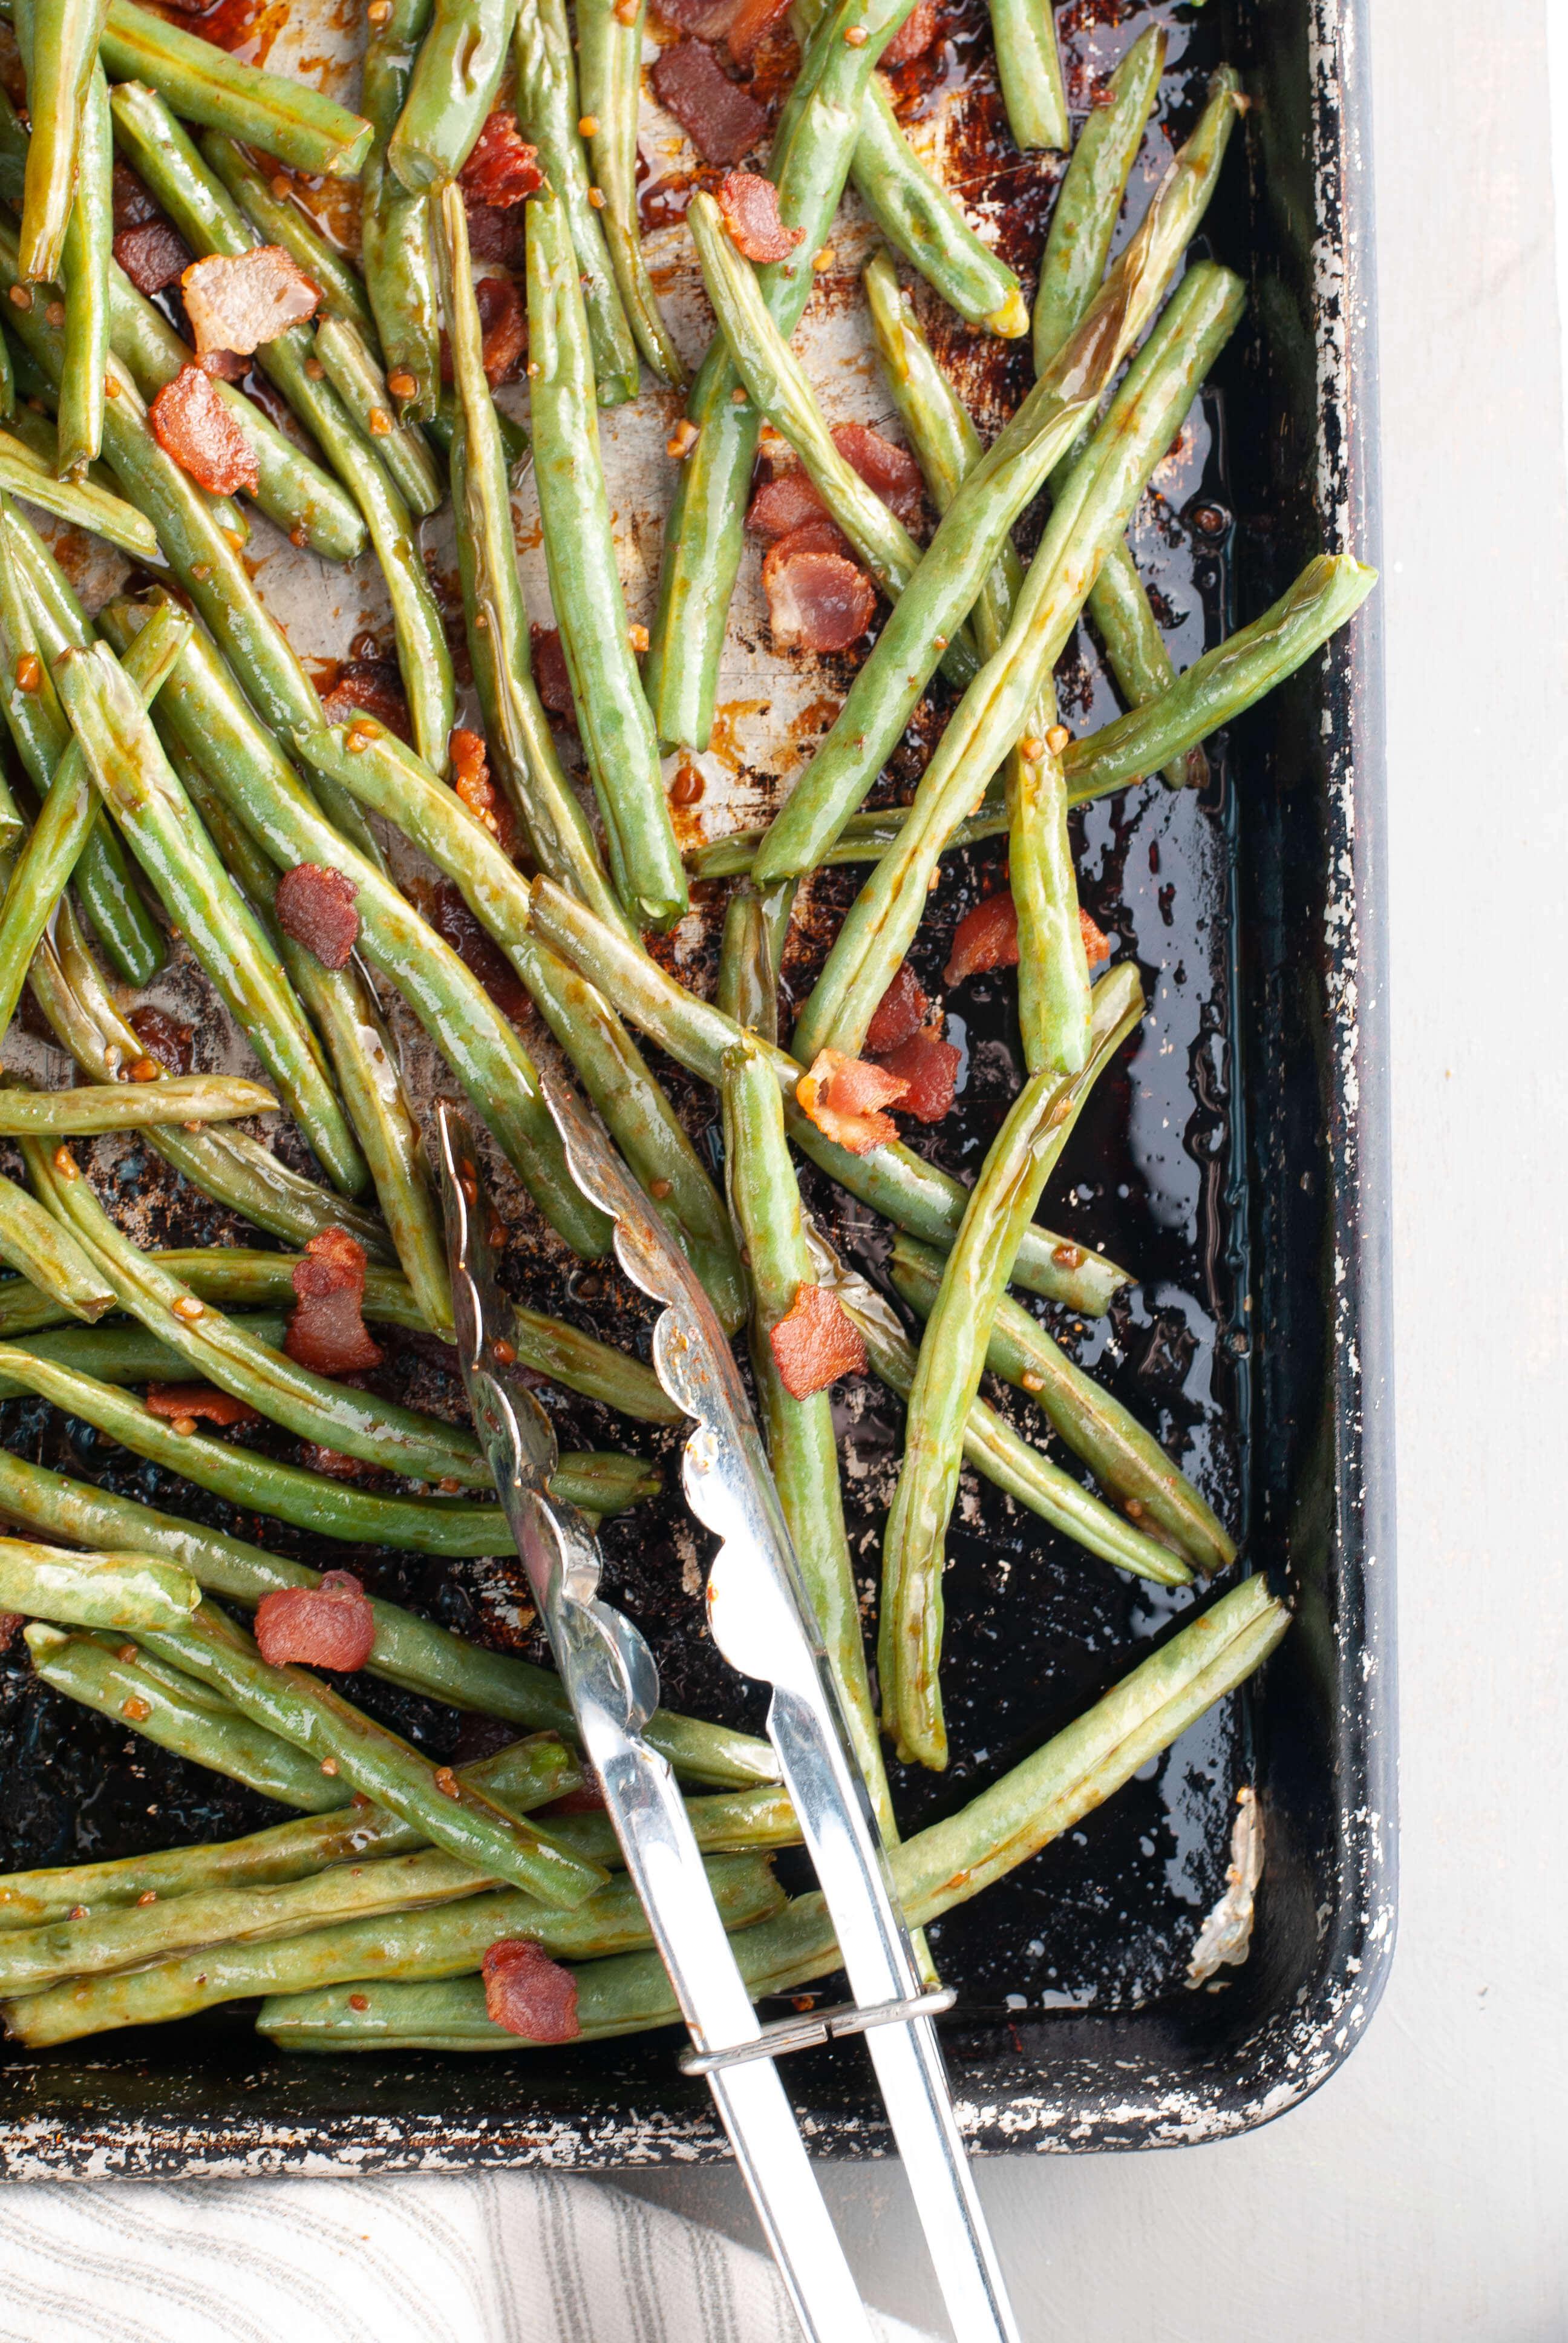 Oven Roasted Garlic Bacon Brown Sugar Green Beans Allergy